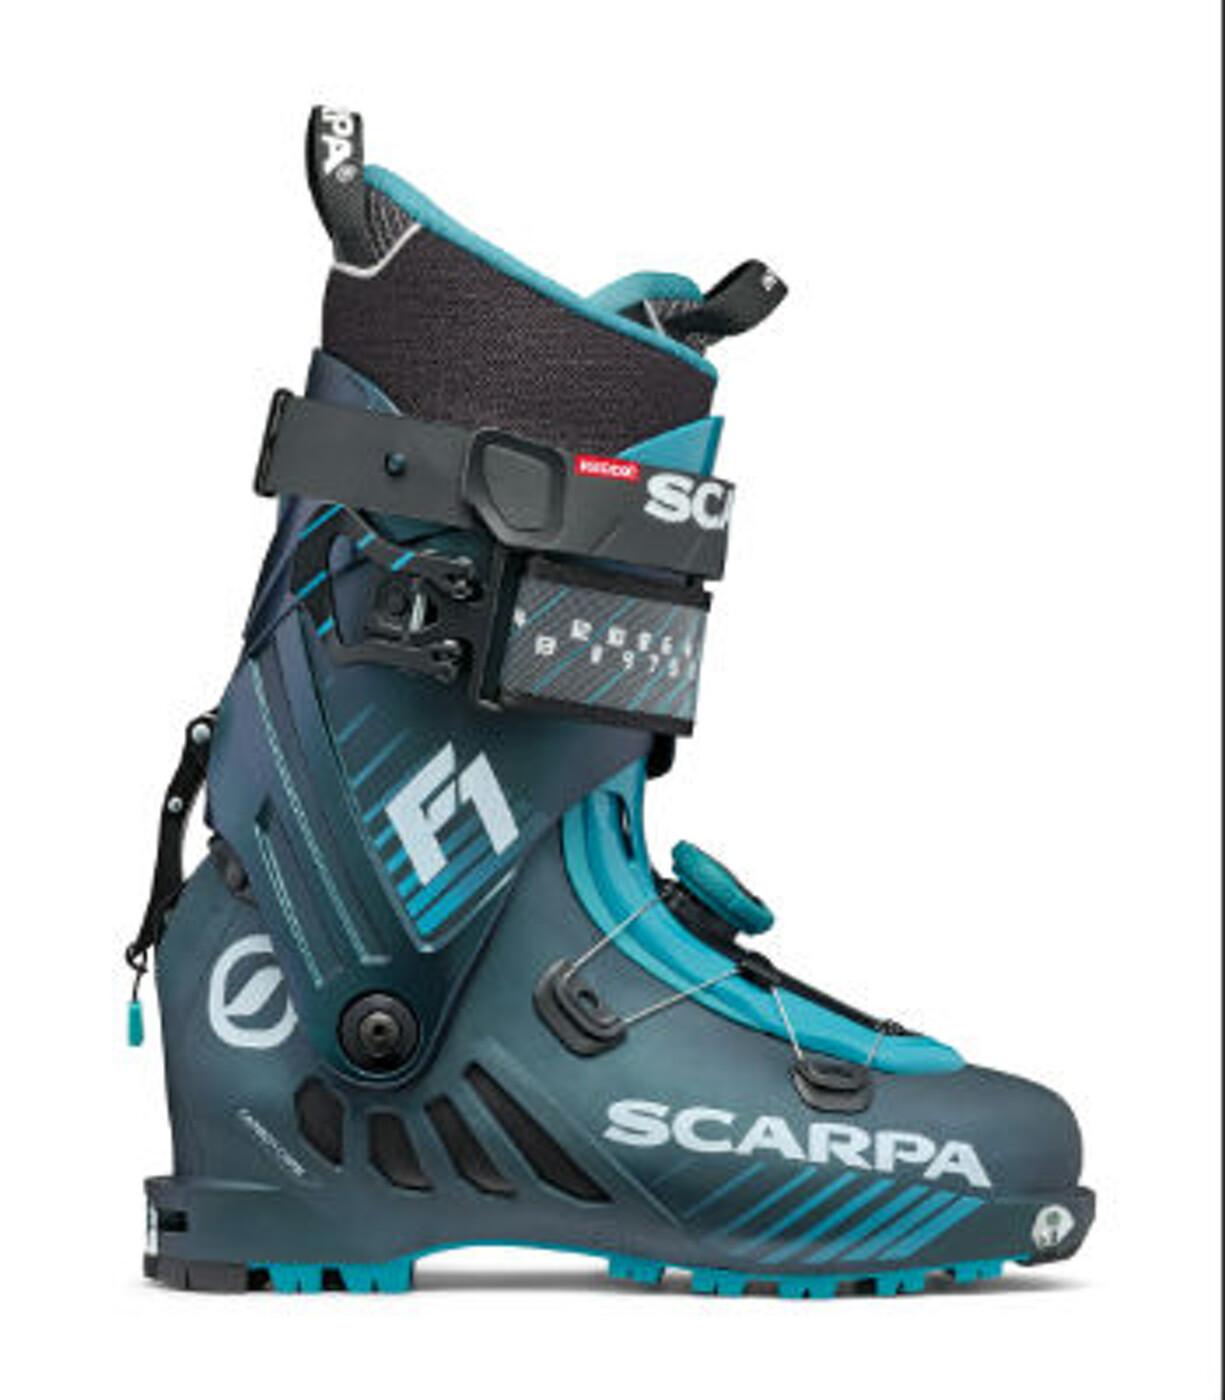 SCARPA F1 Skitourenschuh - Herren